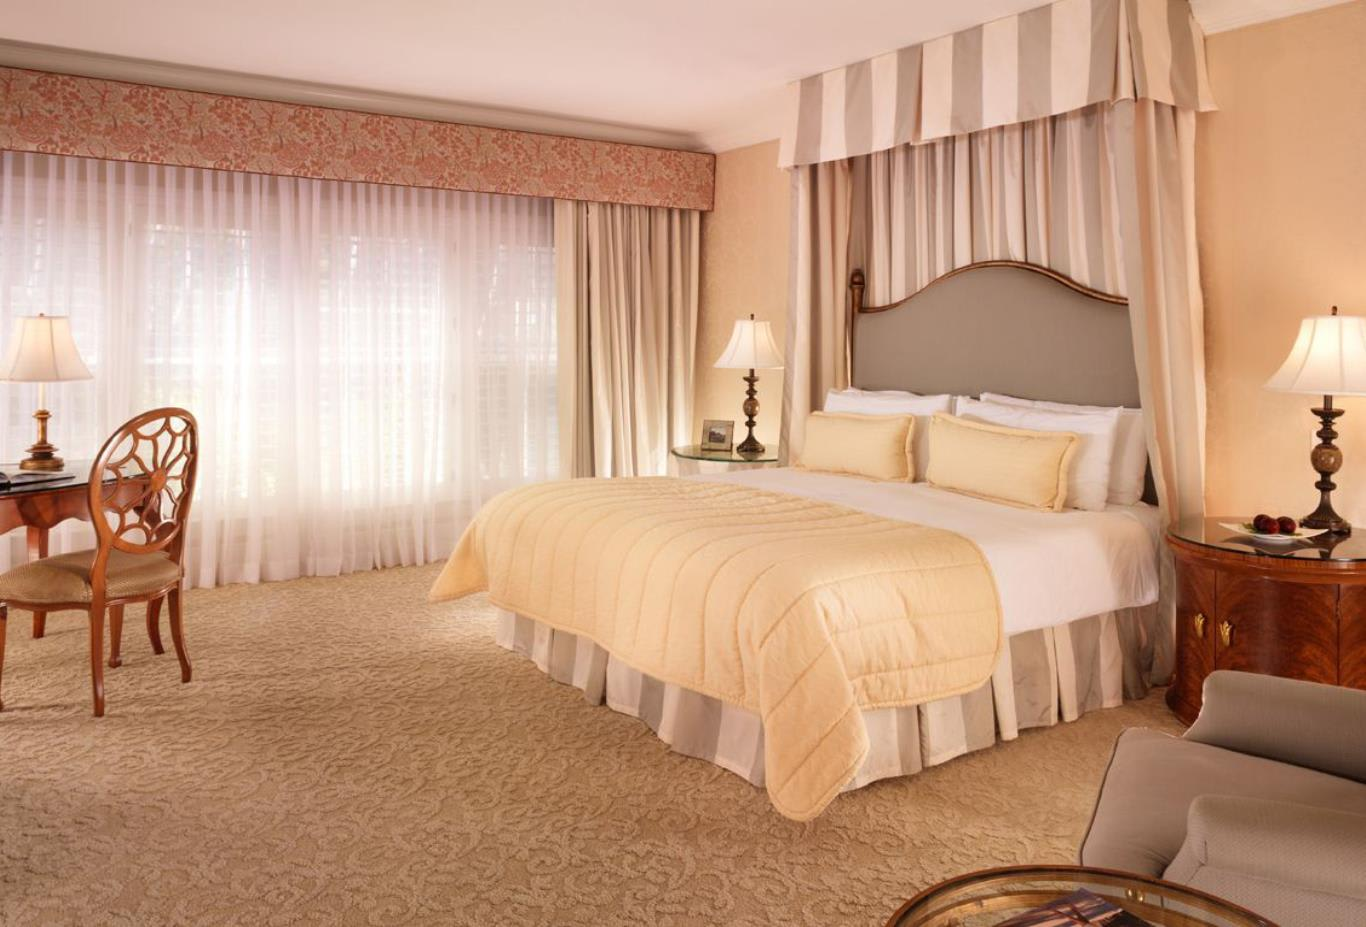 Bungalow-Room